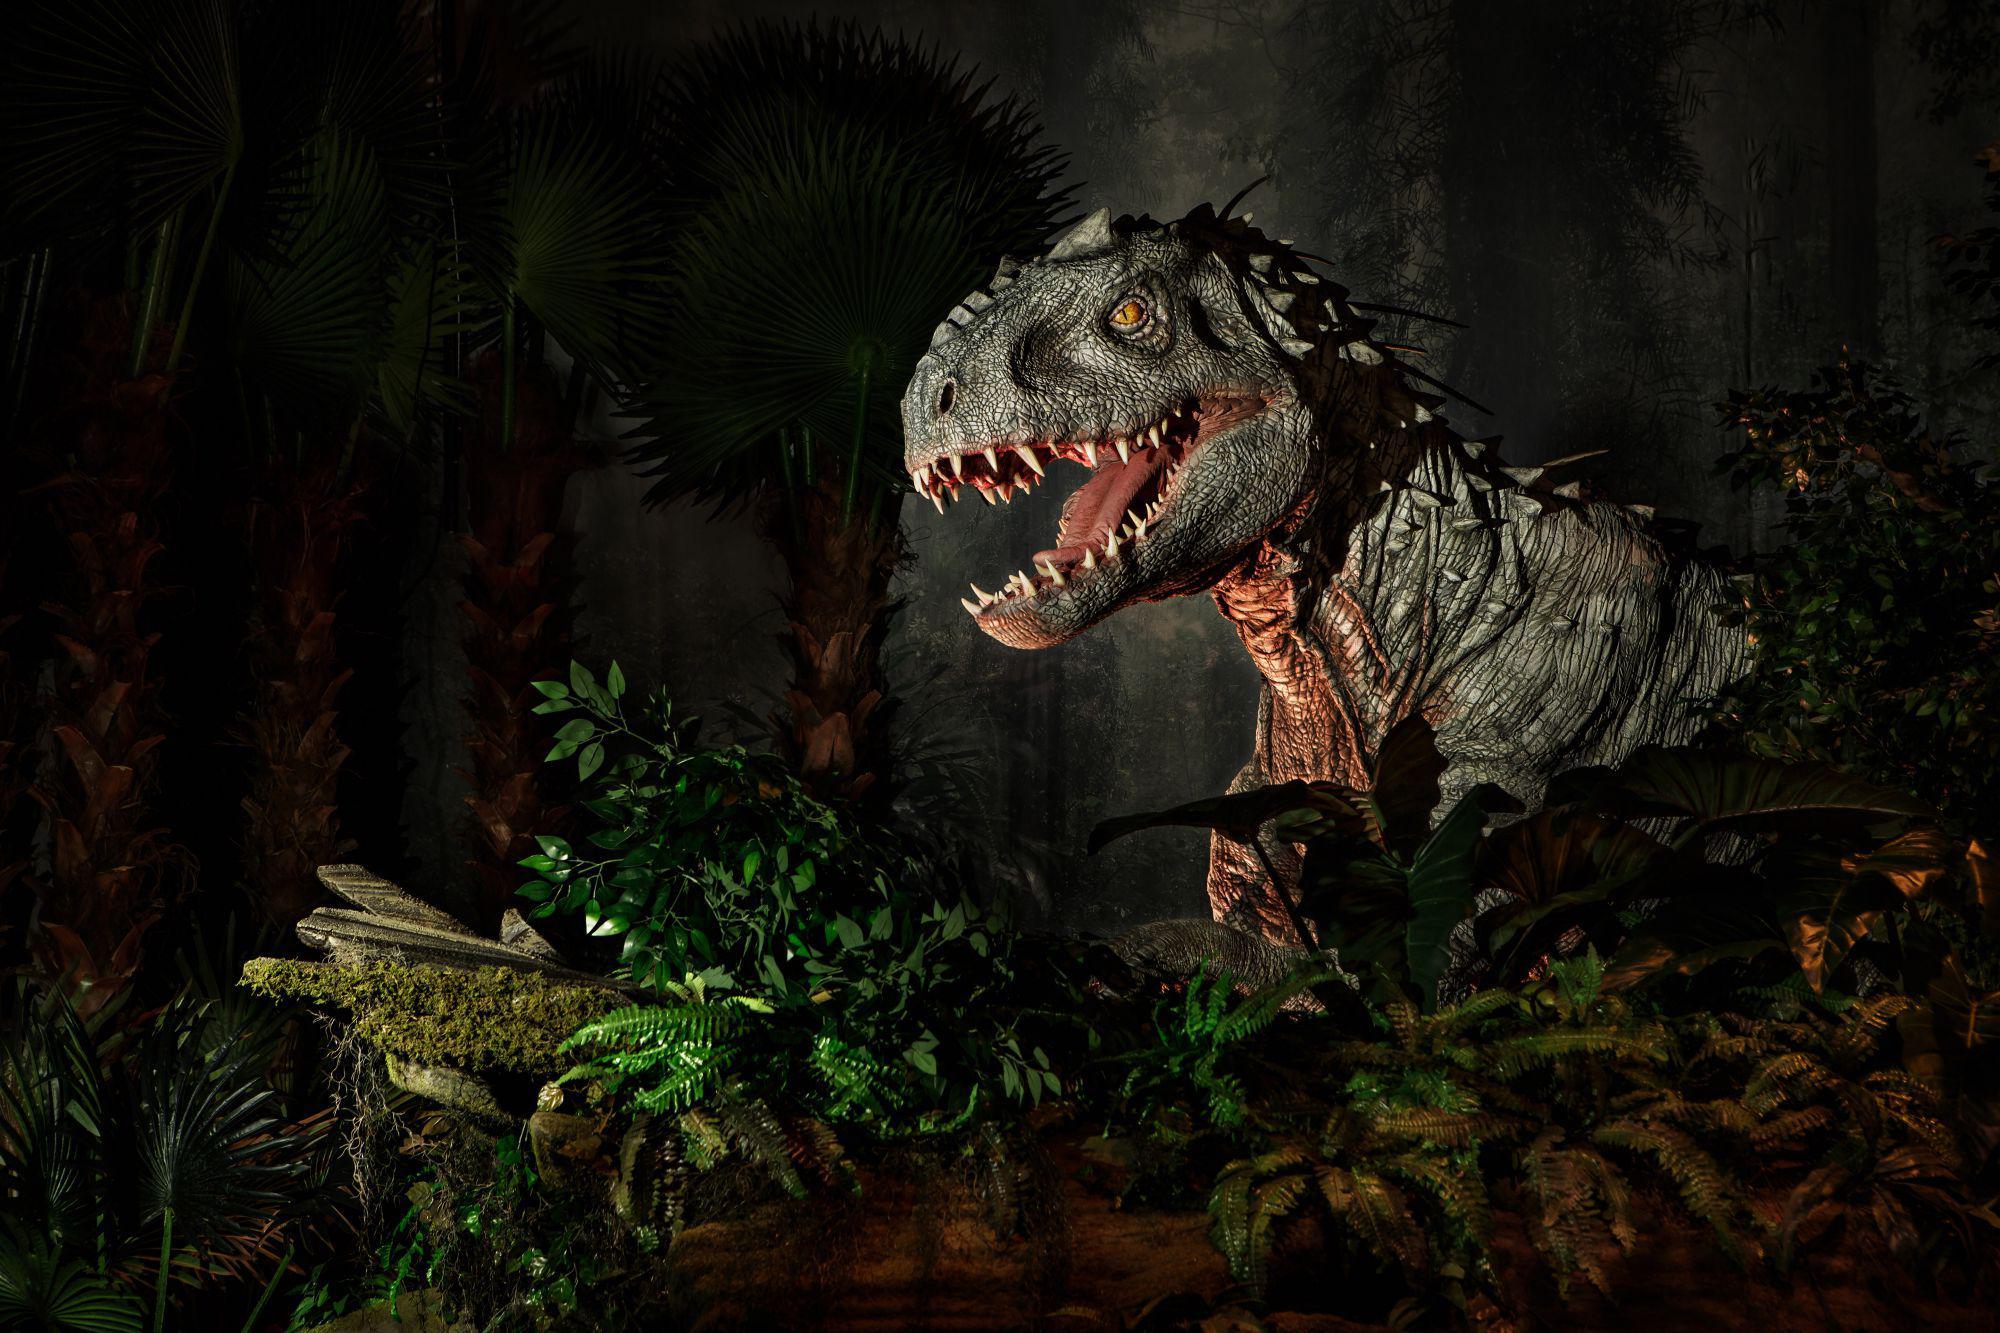 Los dinosaurios de Jurassic World llegan a Madrid en noviembre